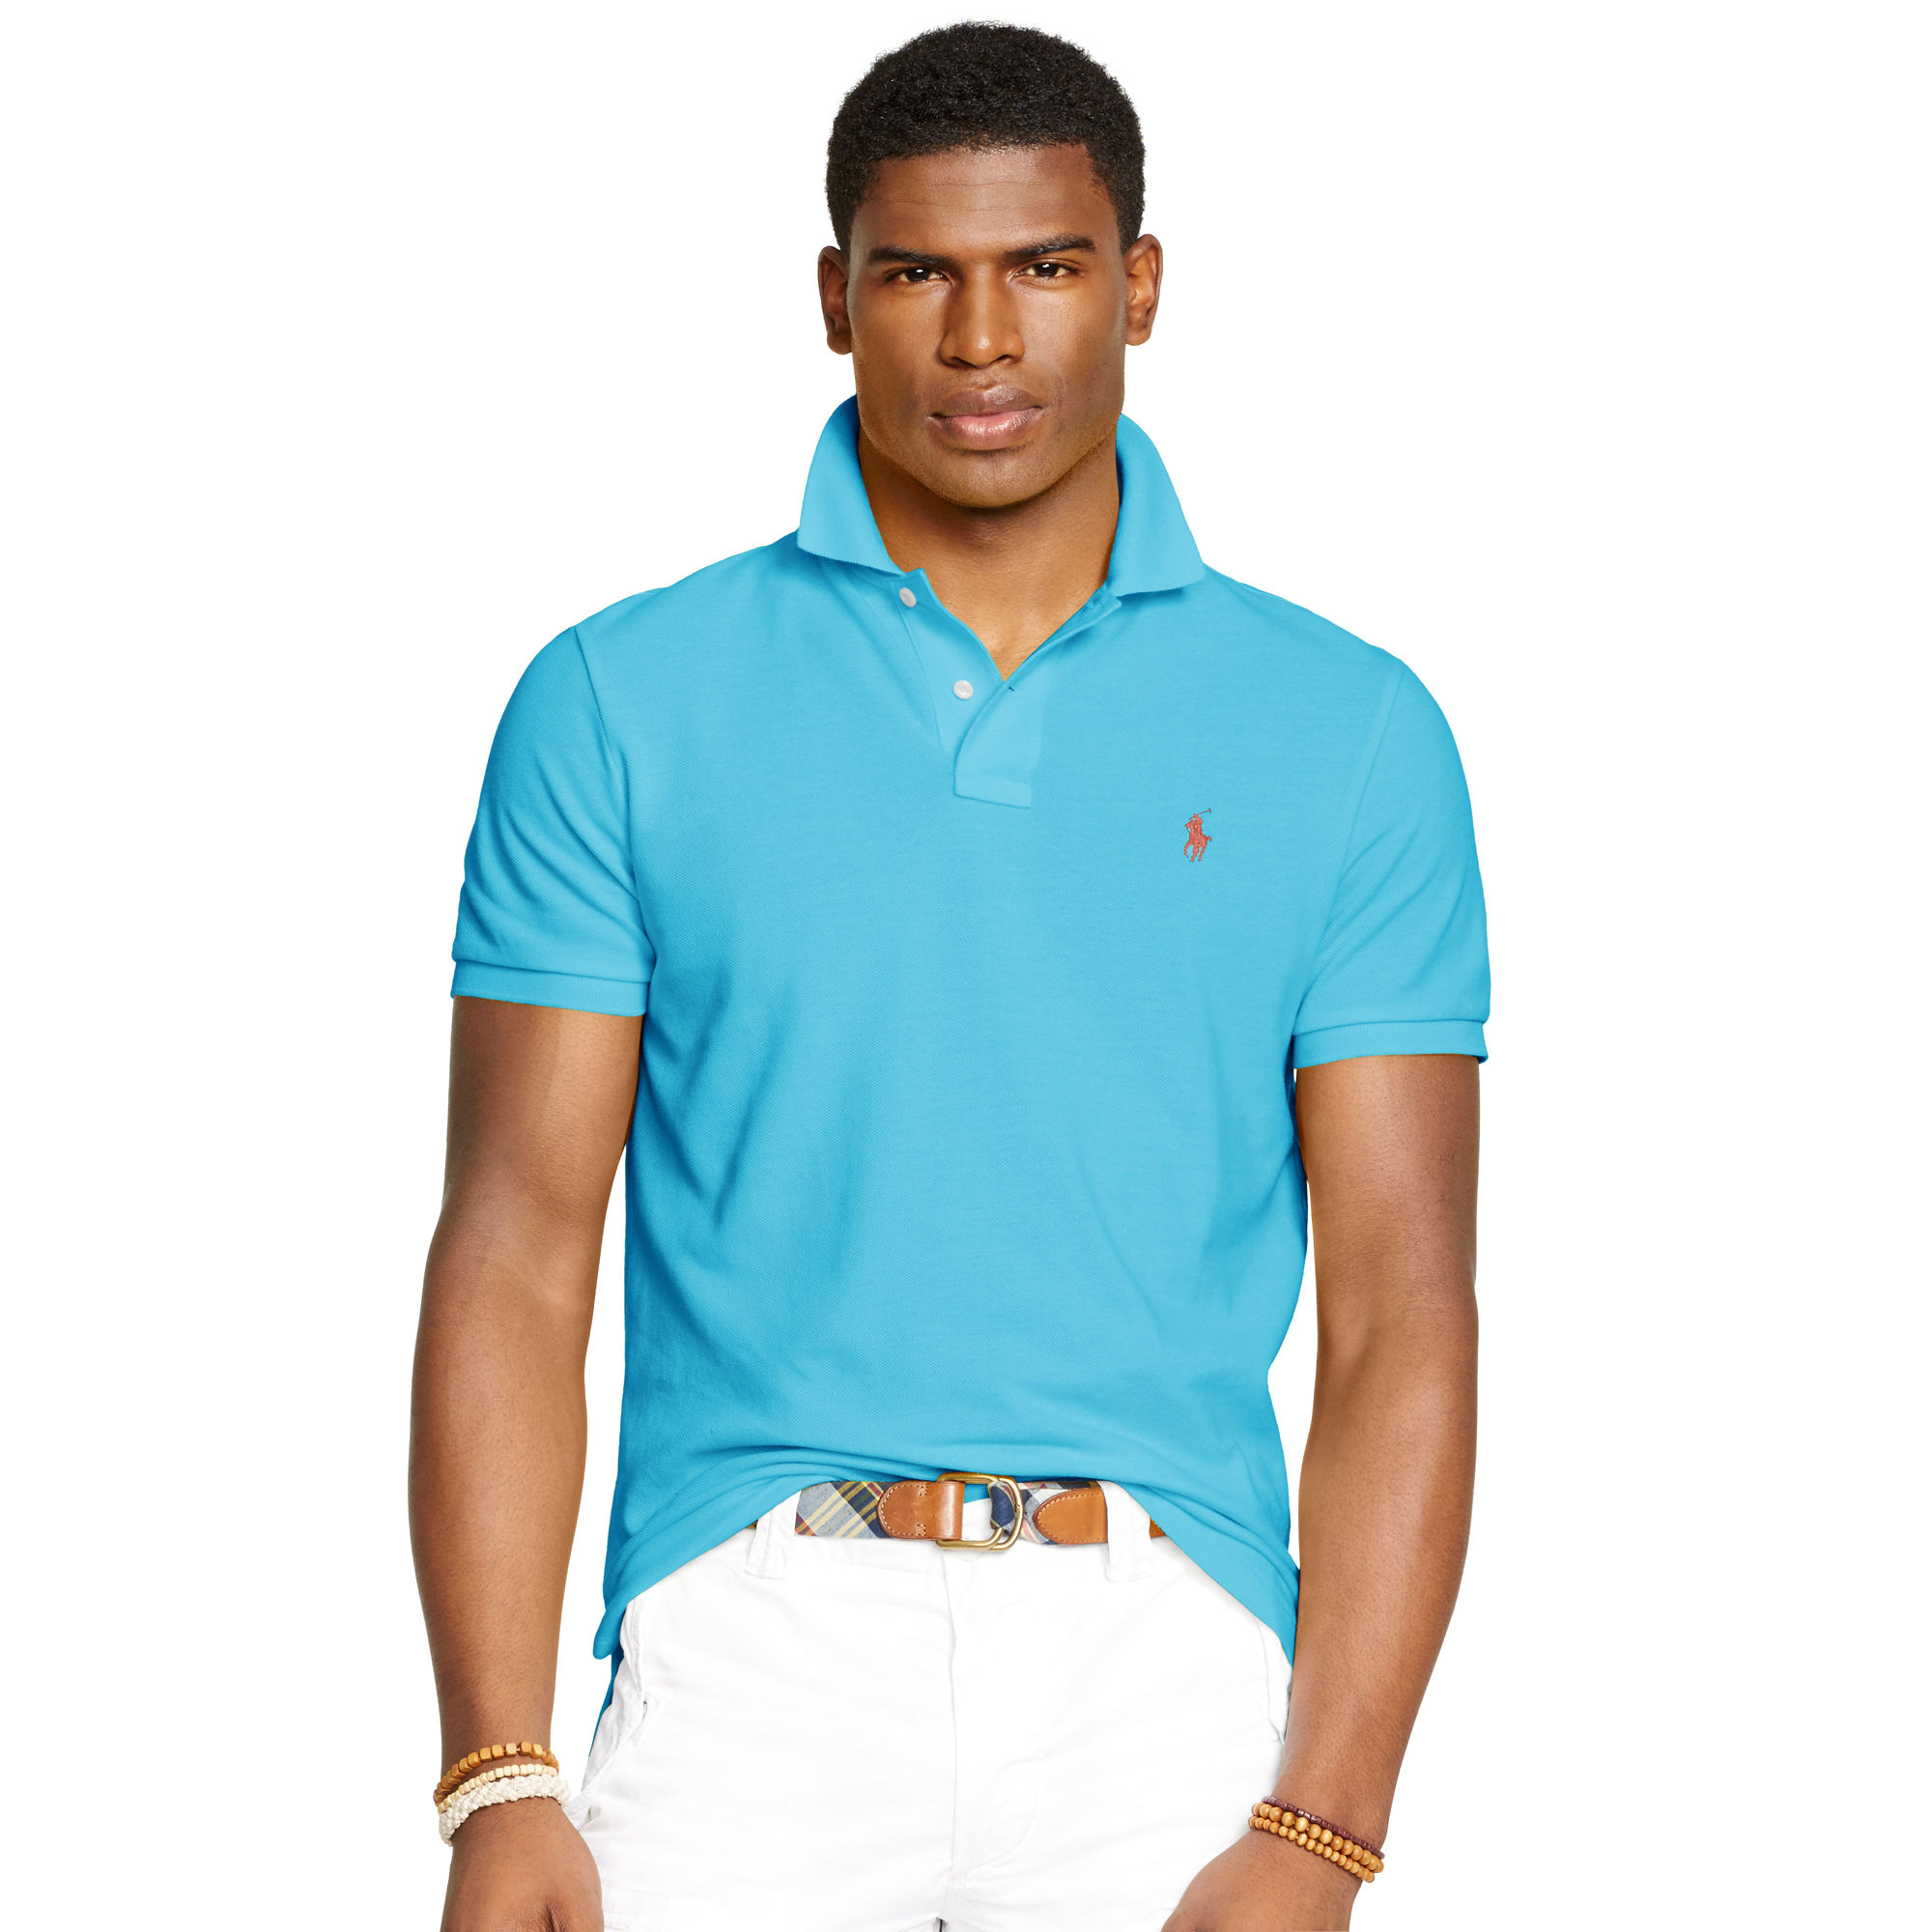 066aab6f Polo Ralph Lauren Custom-fit Mesh Polo Shirt in Blue for Men - Lyst